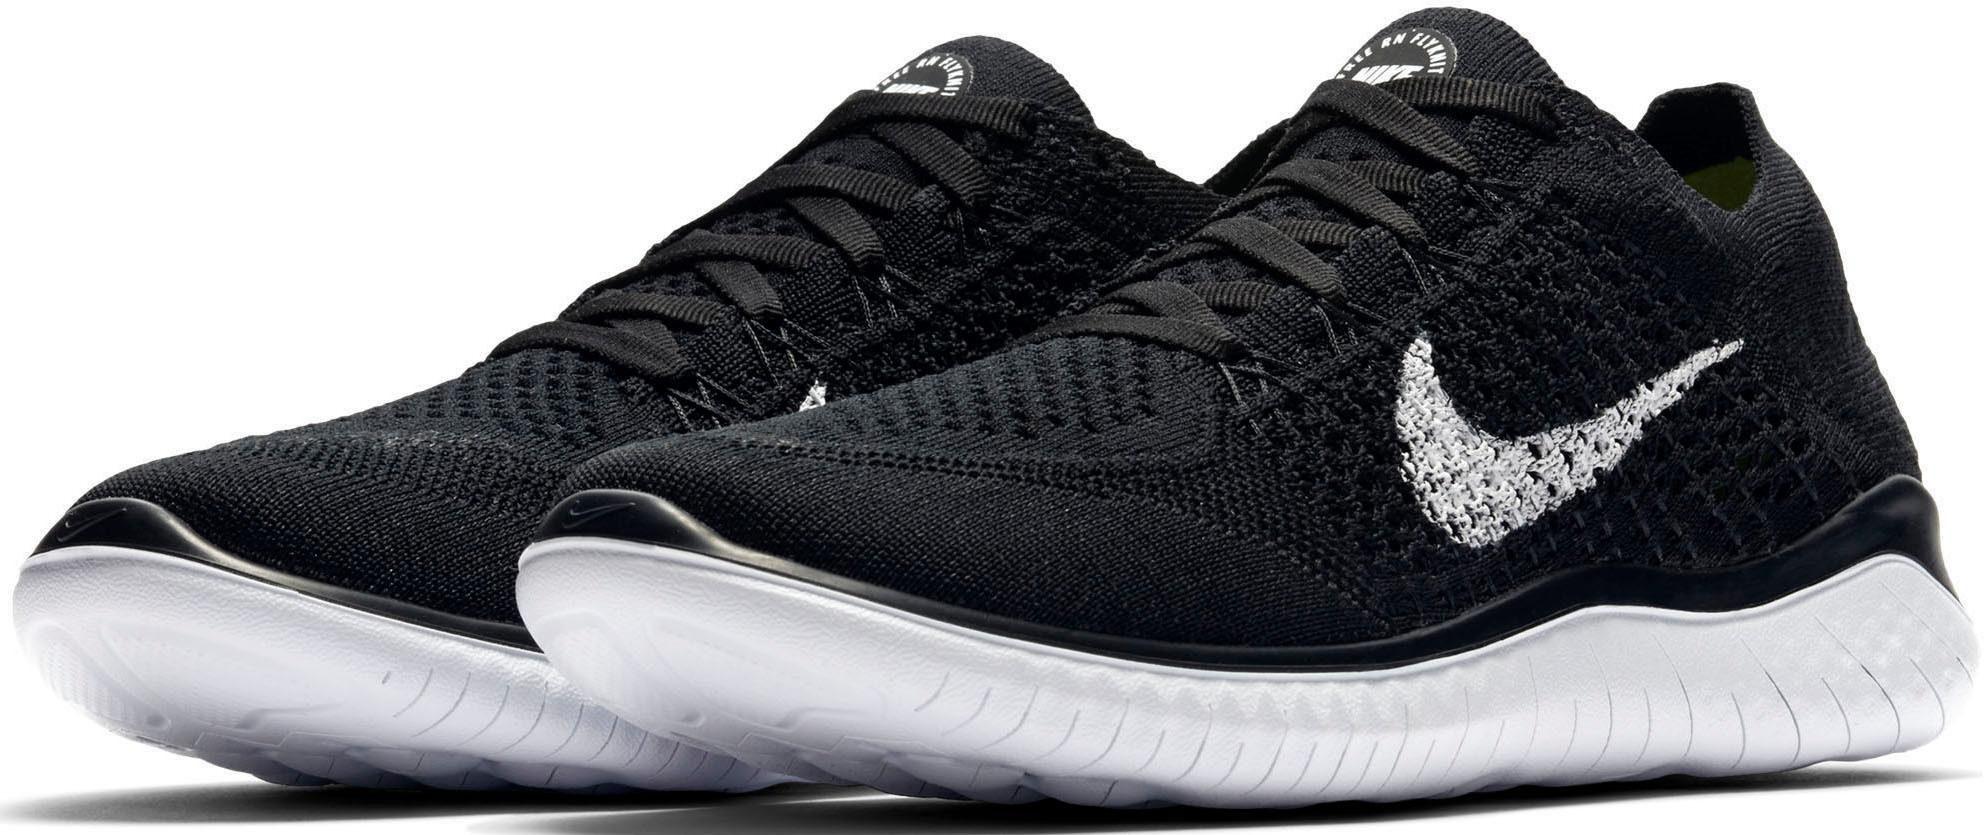 Nike »Wmns Free Rn Flyknit« Laufschuh kaufen   OTTO